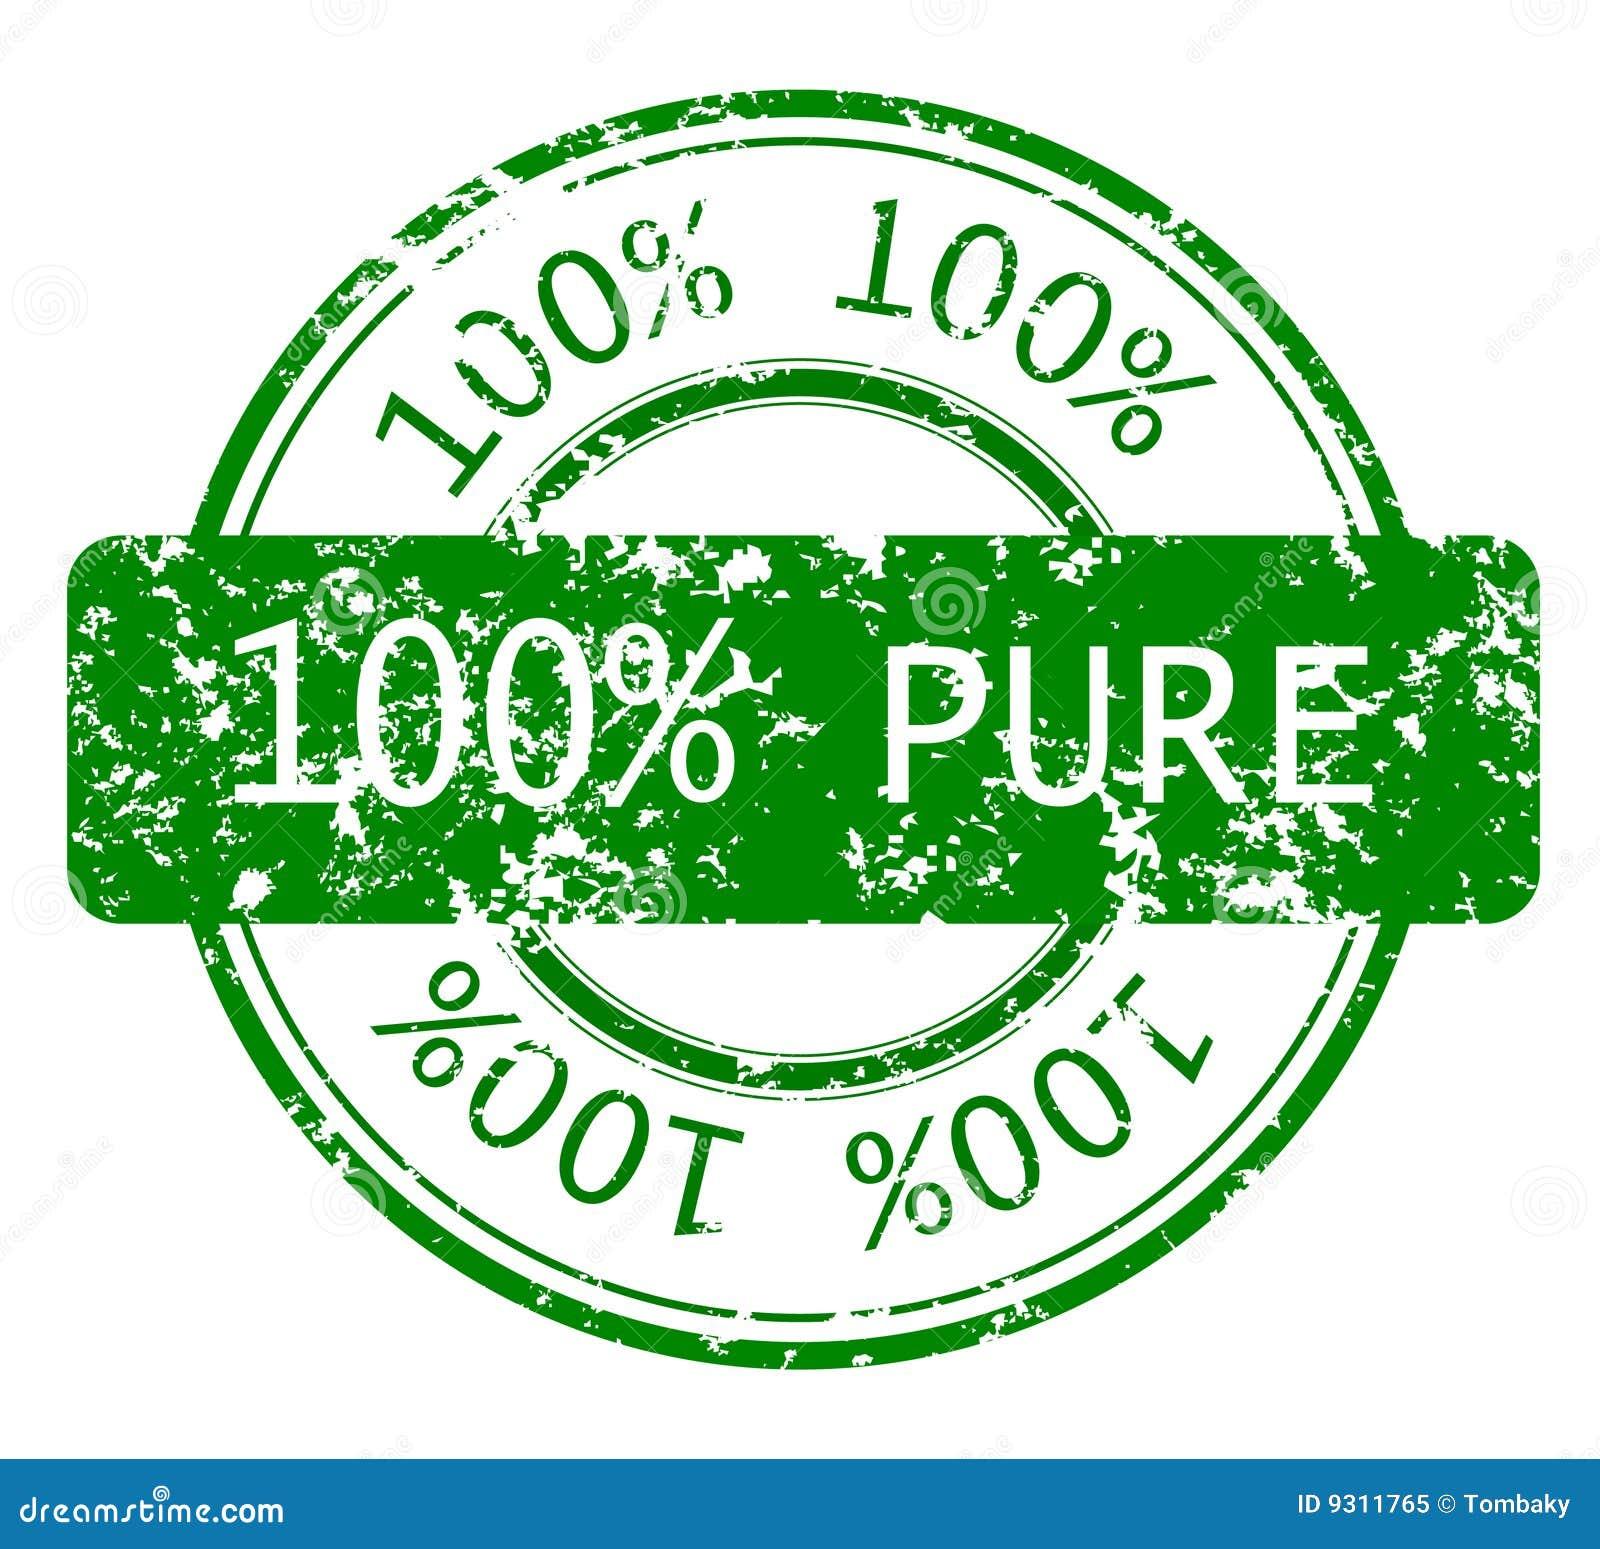 100 percent pure logo dating 3